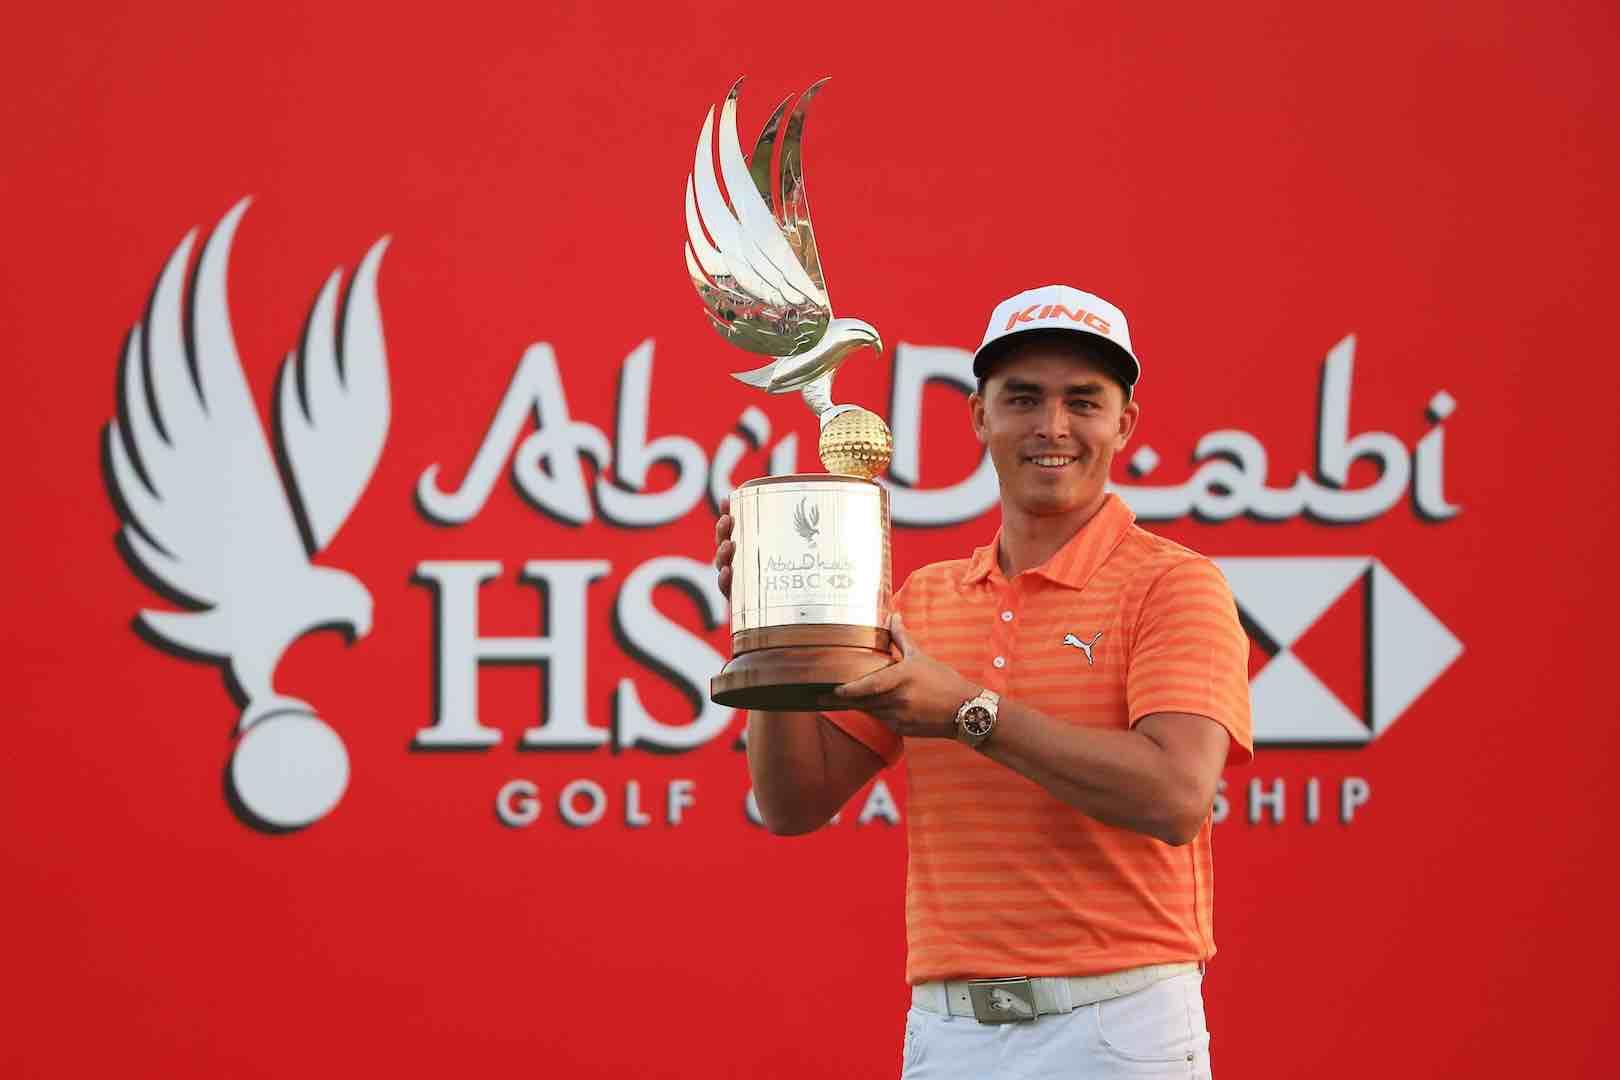 European quartet set for Abu Dhabi HSBC